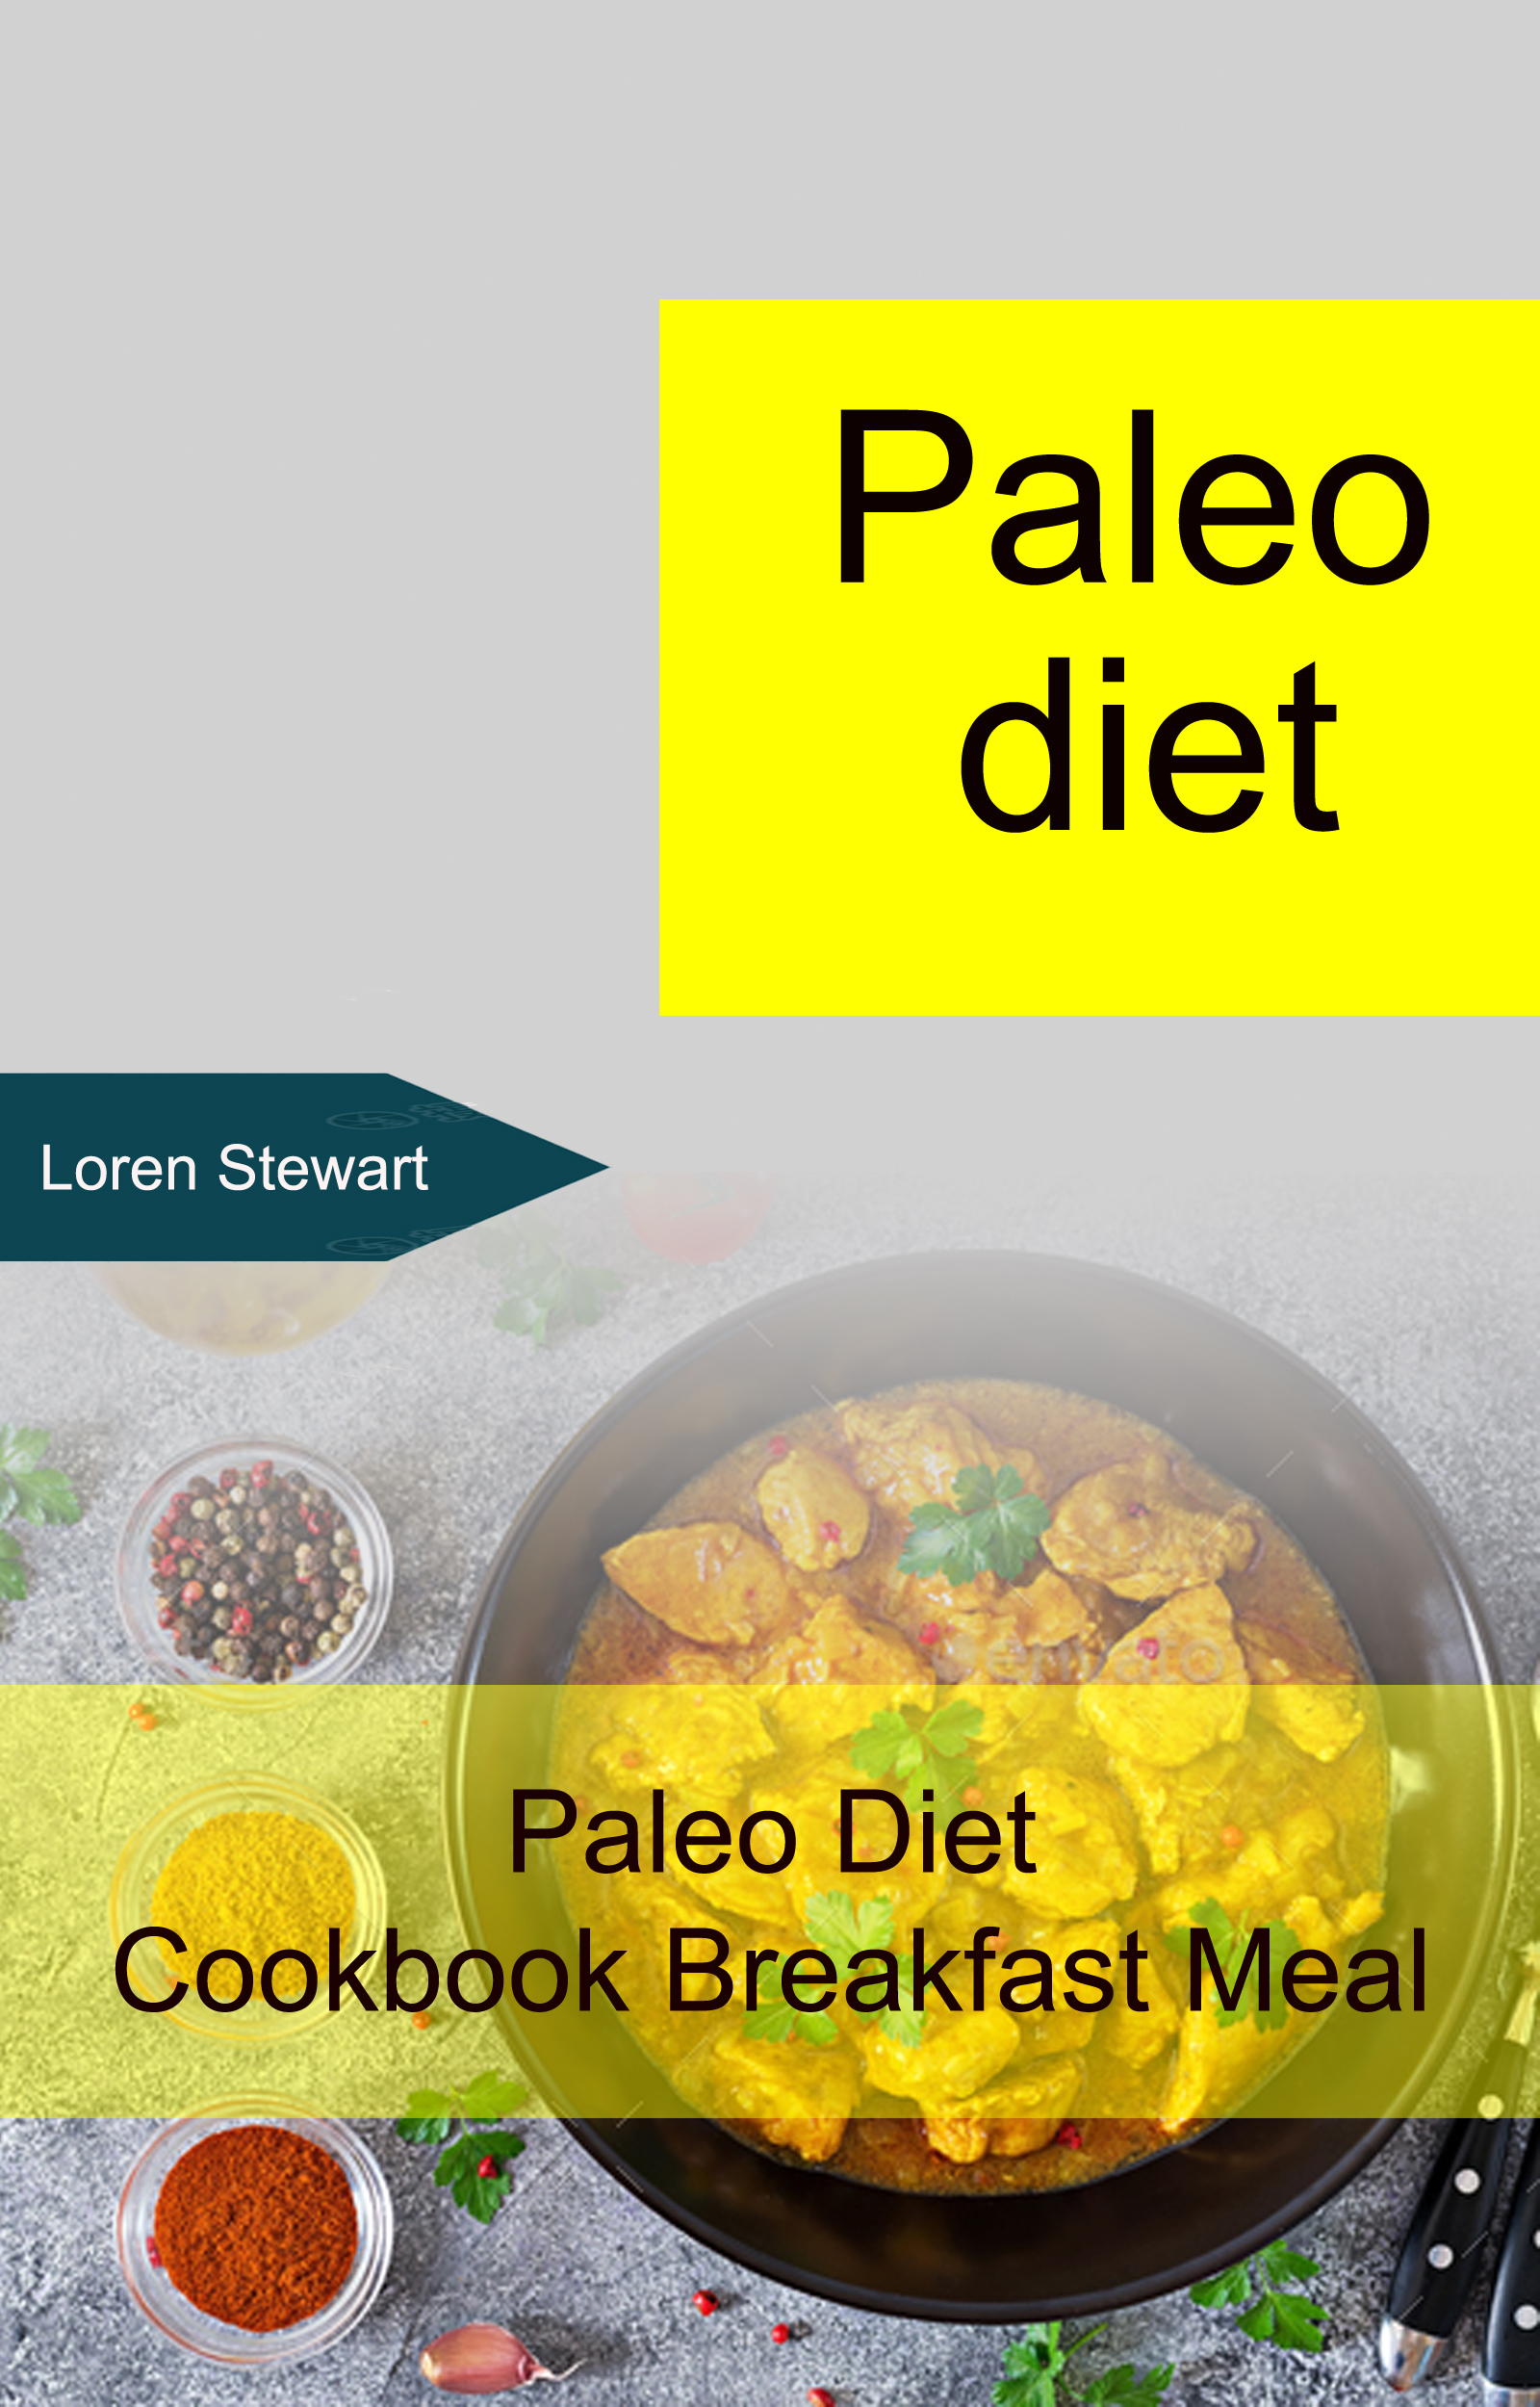 Paleo diet: paleo diet cookbook breakfast meal